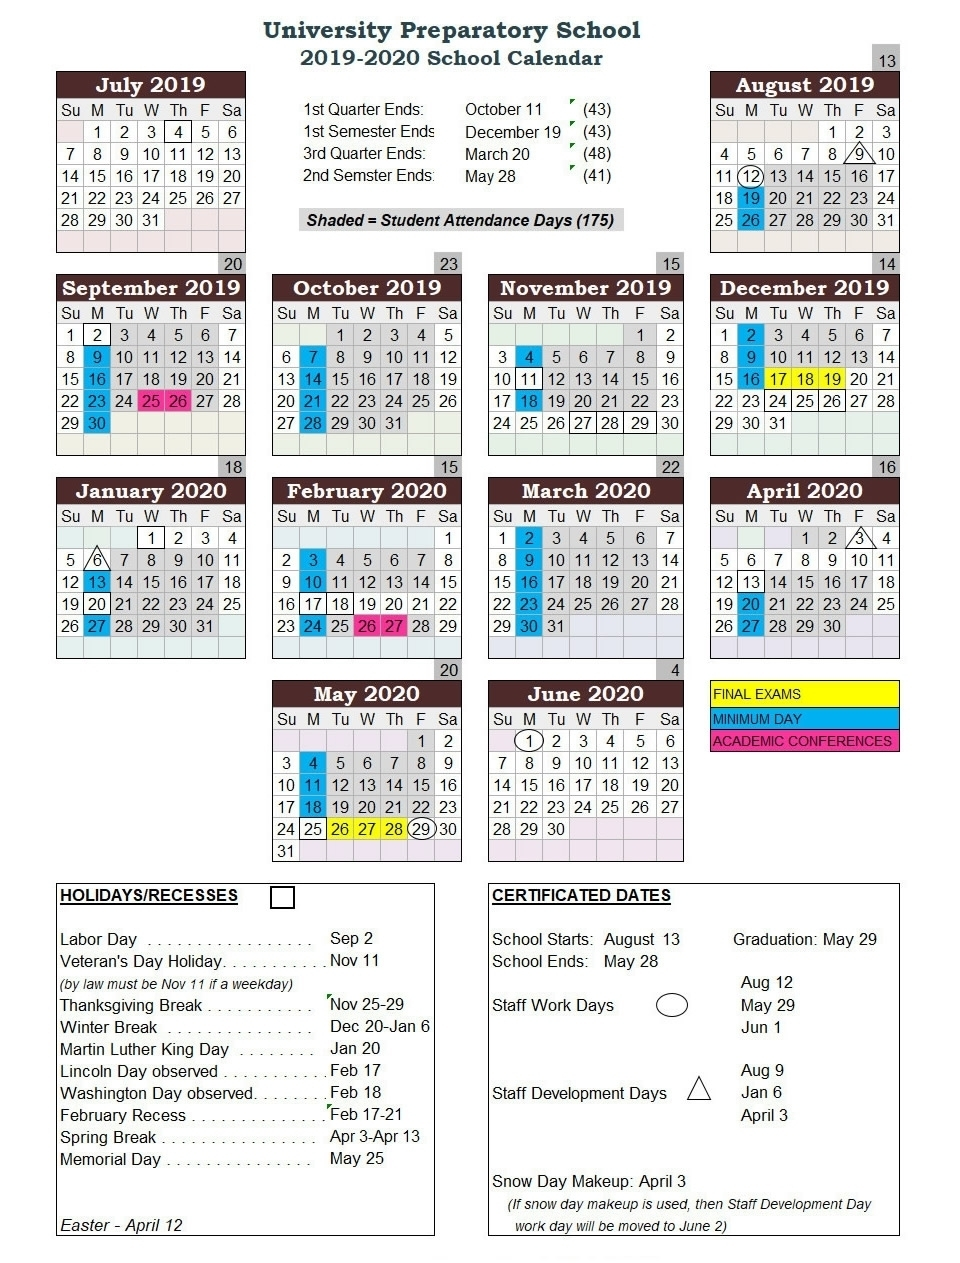 U Of M School Calendar 2020   Calendar Design Ideas for U Of M Calendar 2019-2020 School Year